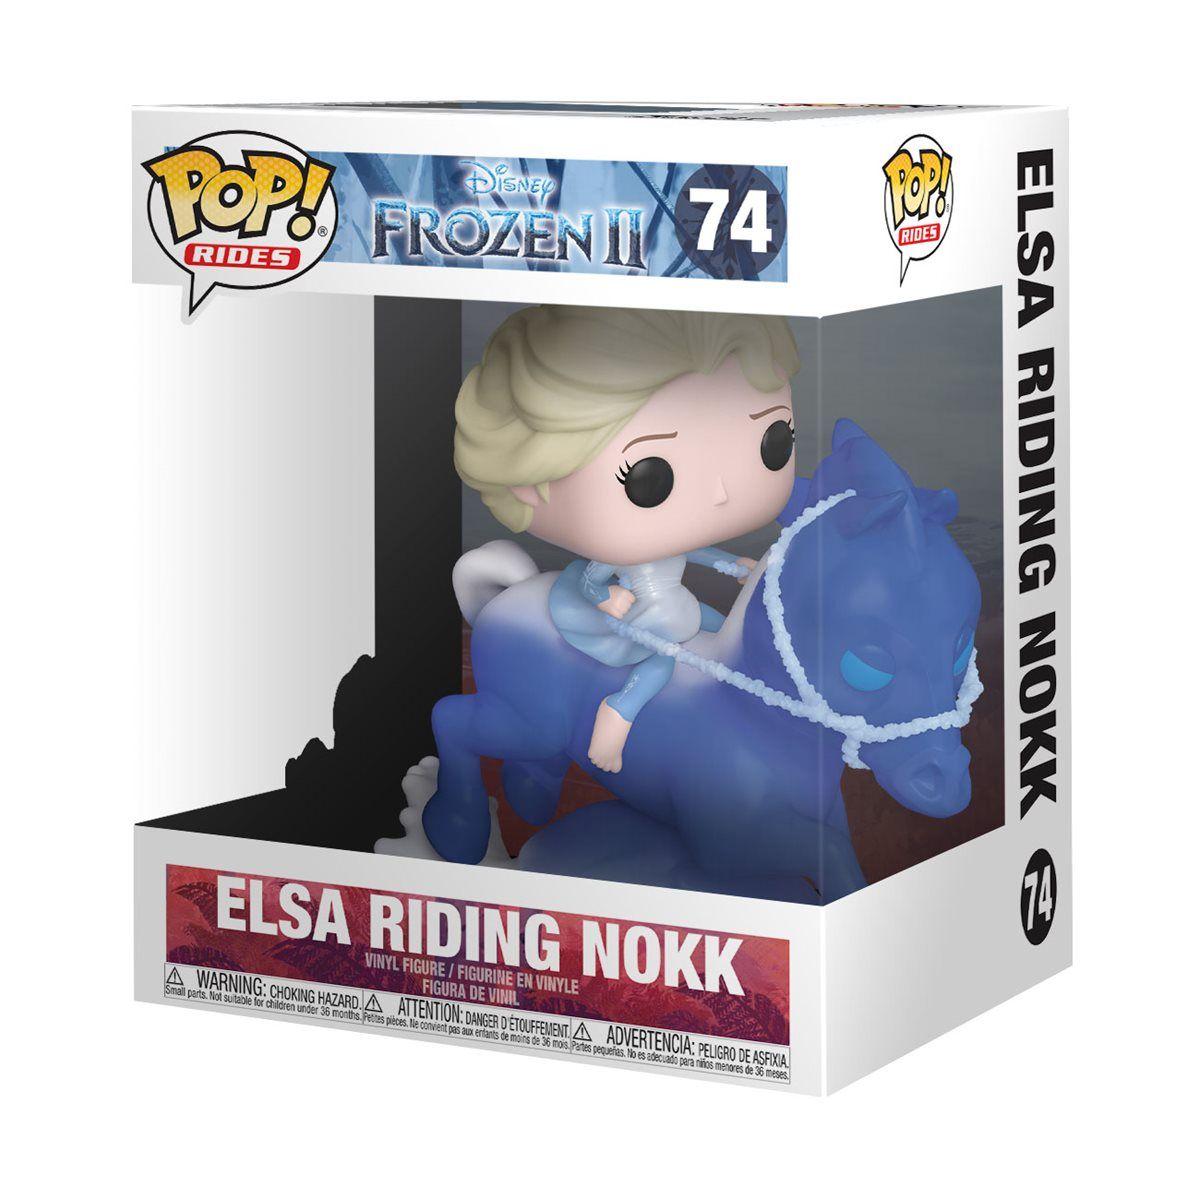 Frozen 2 Elsa Riding Nokk Pop Vinyl Ride Entertainment Earth In 2020 Funko Pop Disney Funko Pop Dolls Disney Pop